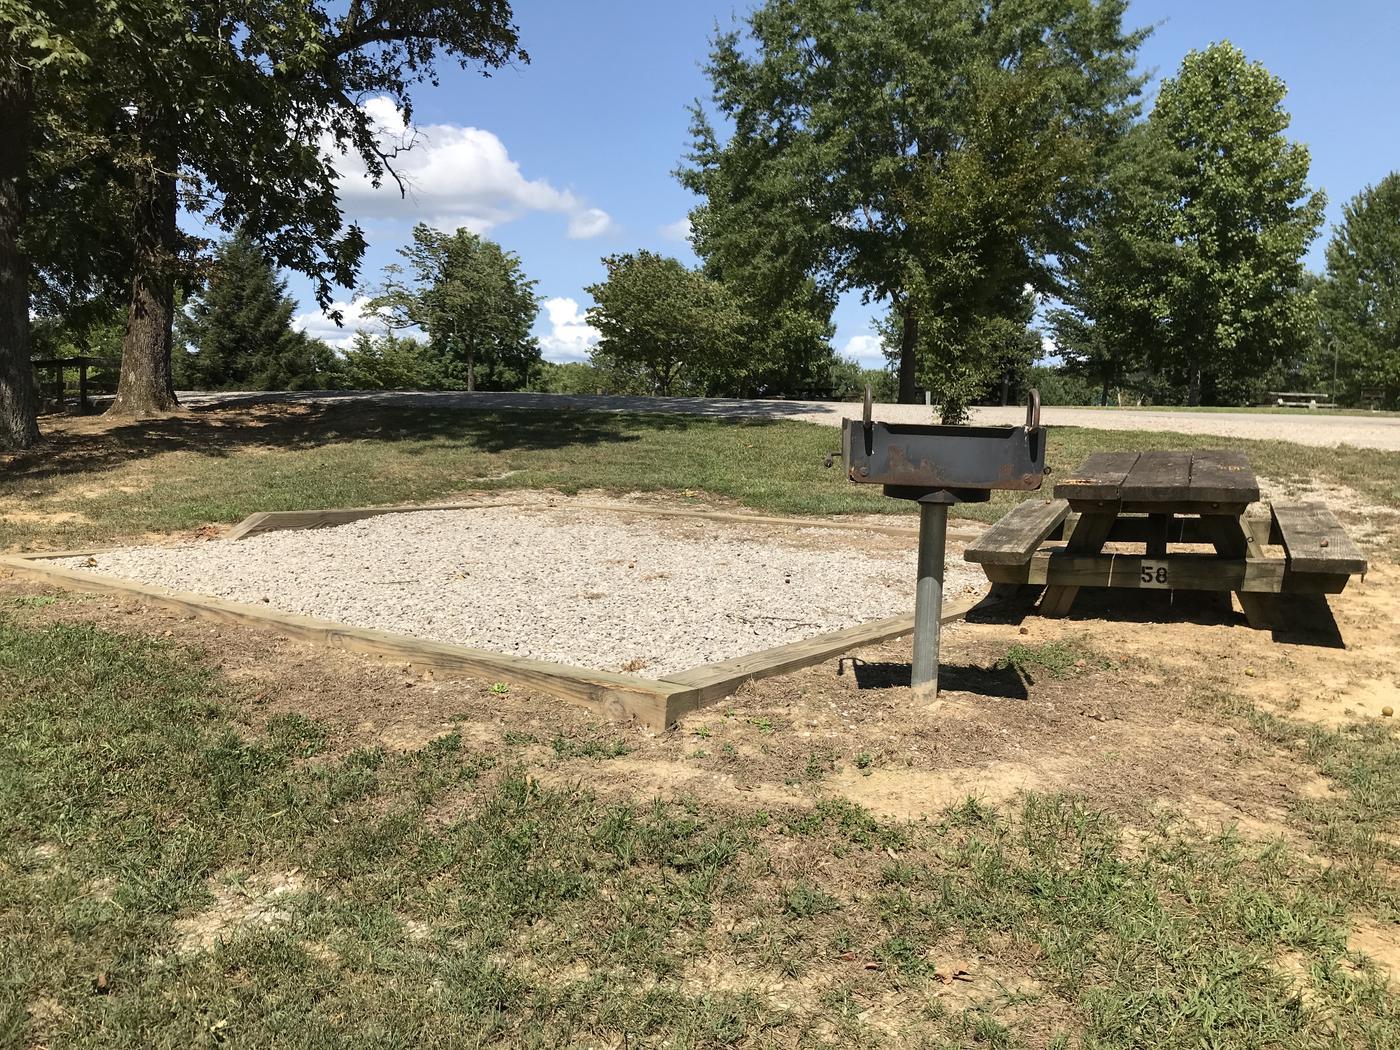 Willow grove site 58 gravel tent pad